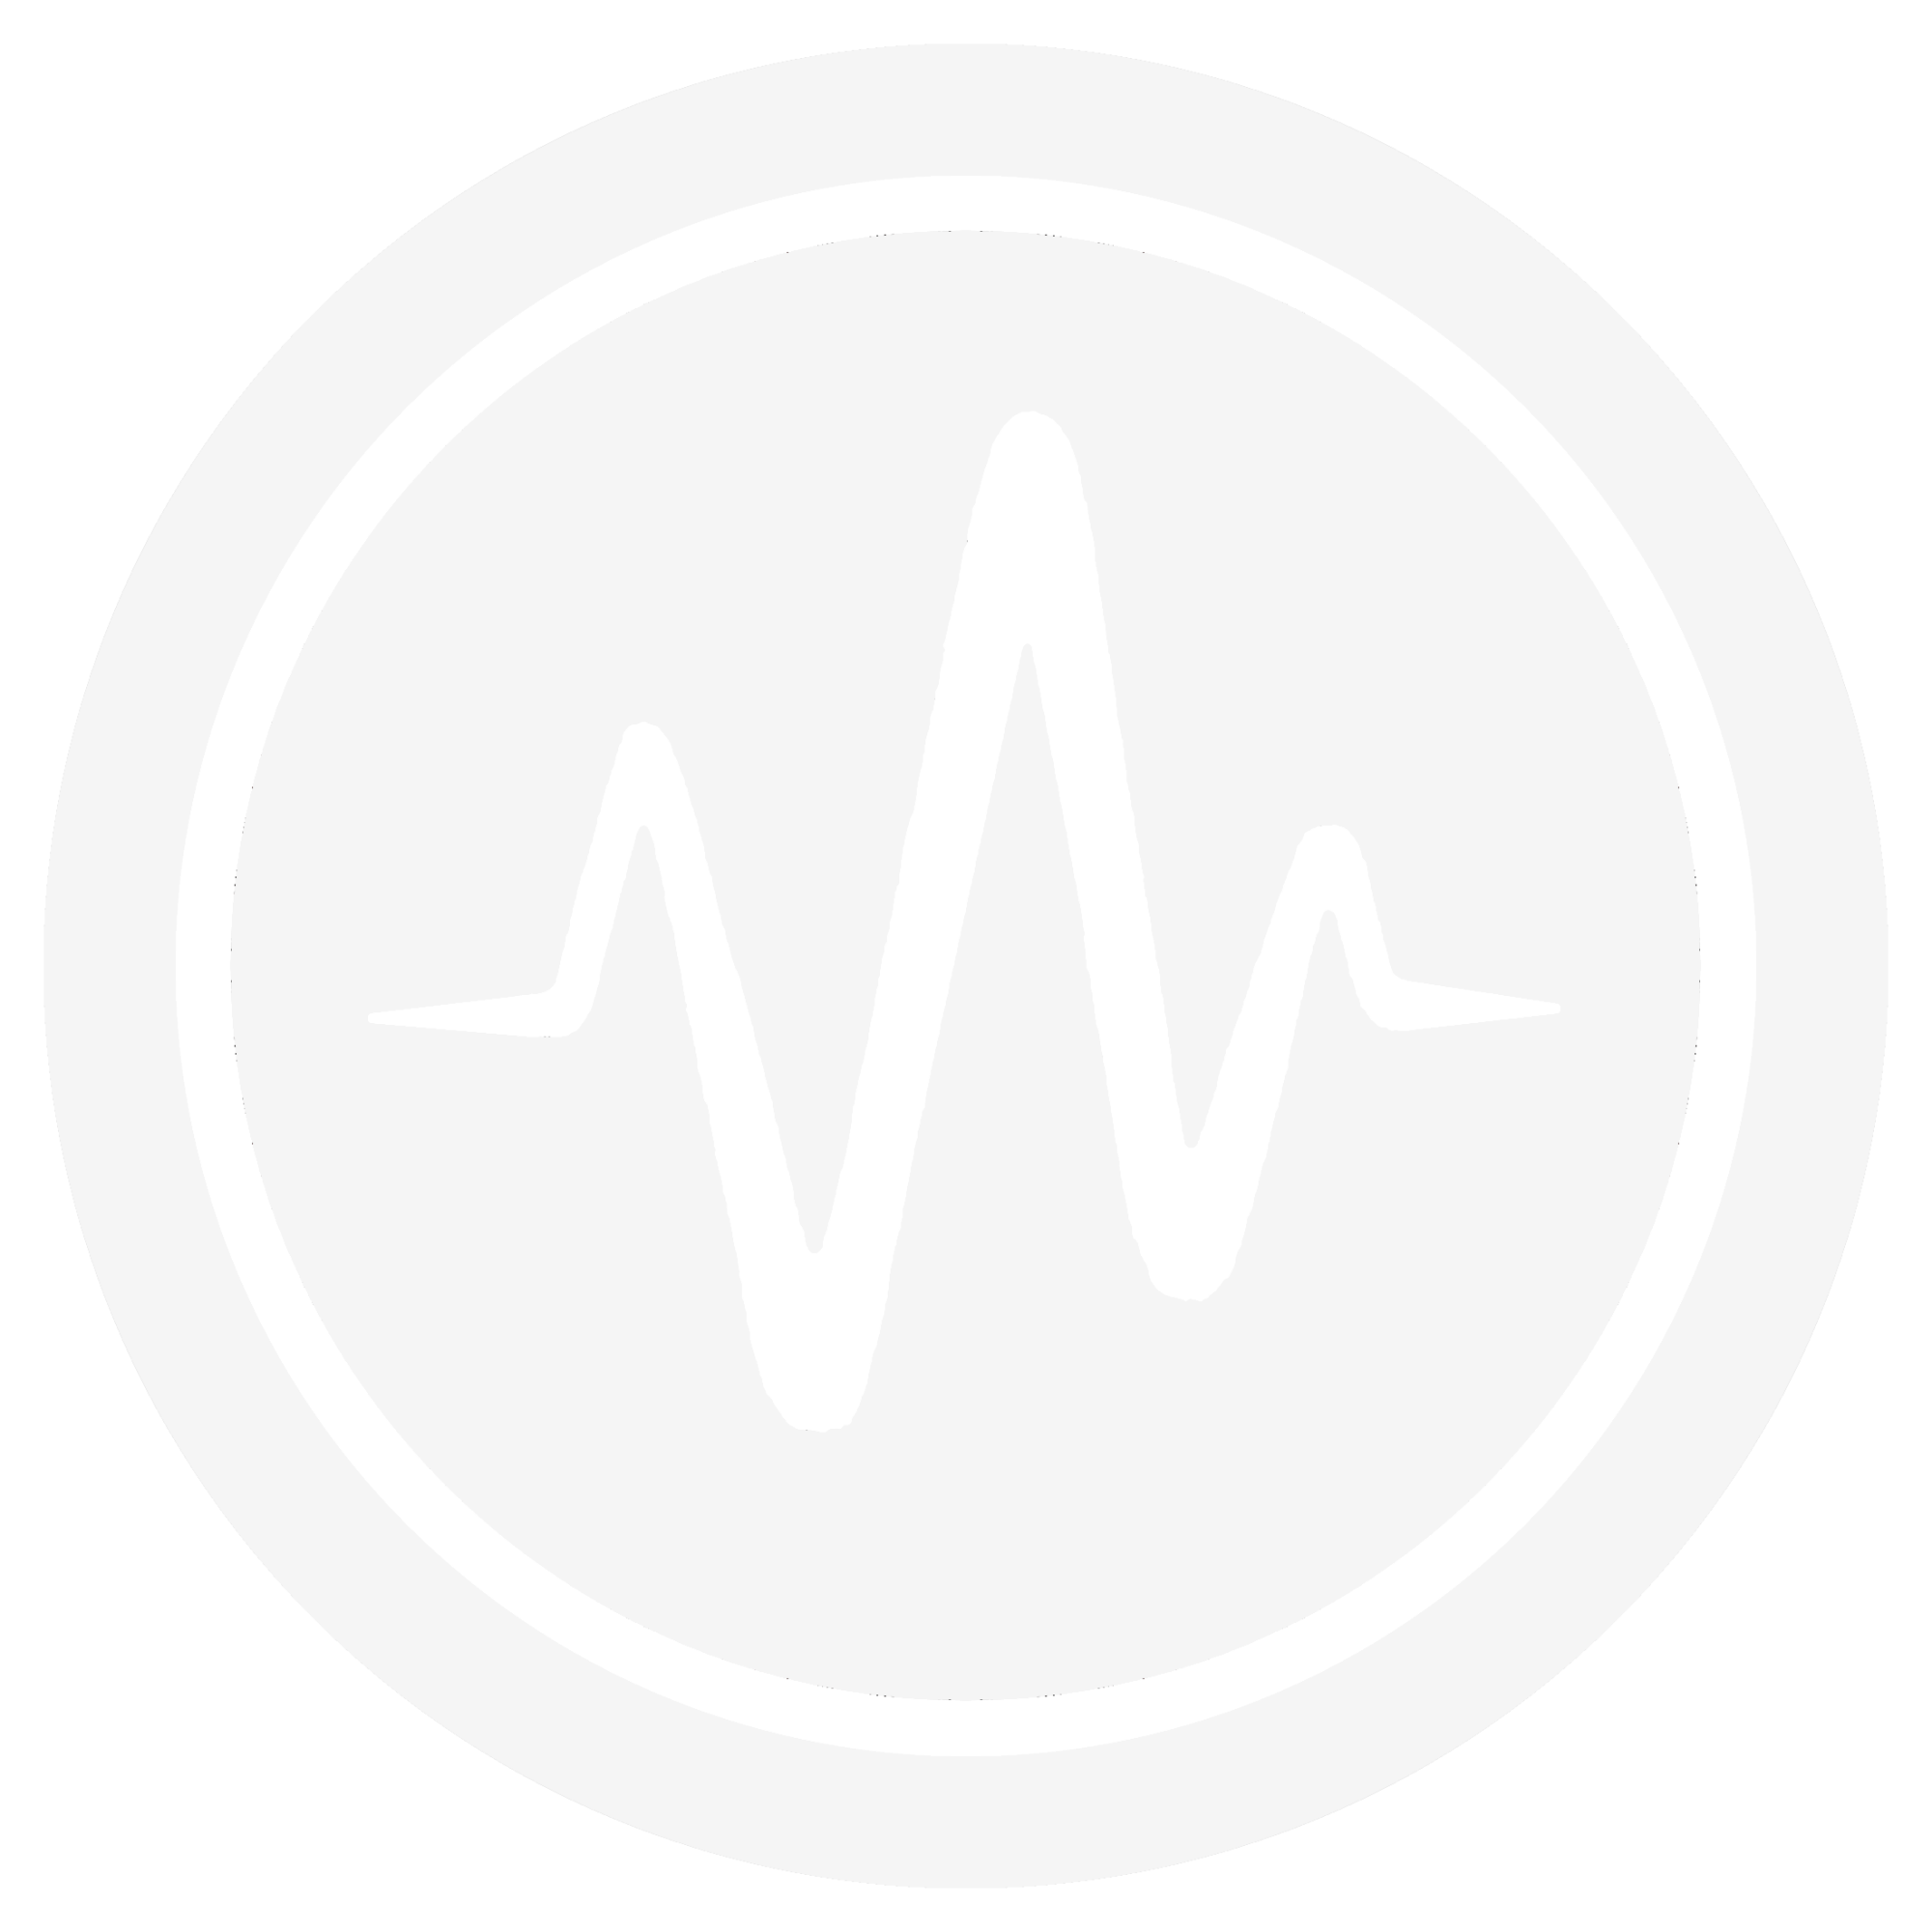 Audioxide emblem